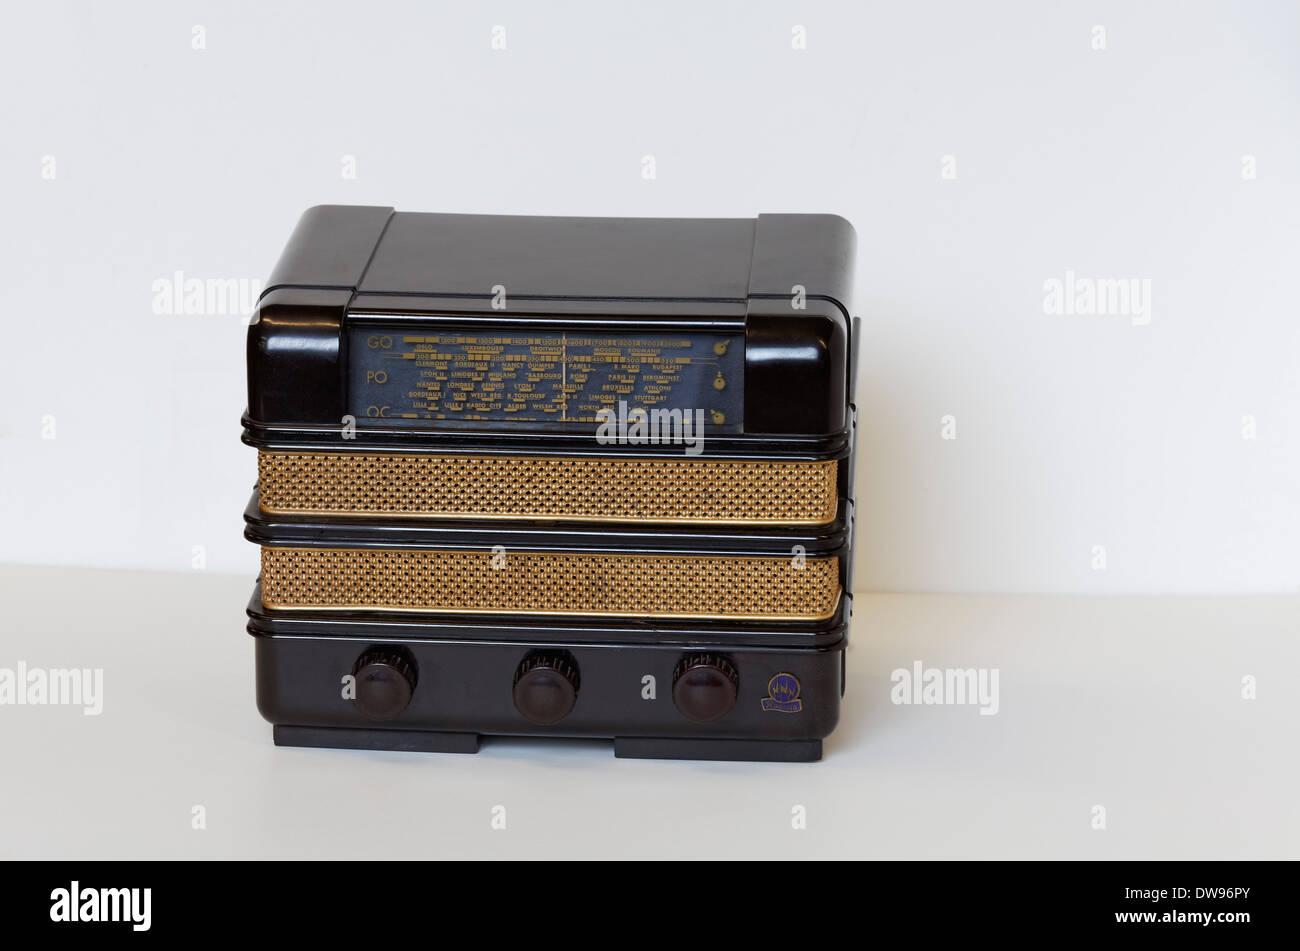 philips radio stockfotos philips radio bilder alamy. Black Bedroom Furniture Sets. Home Design Ideas